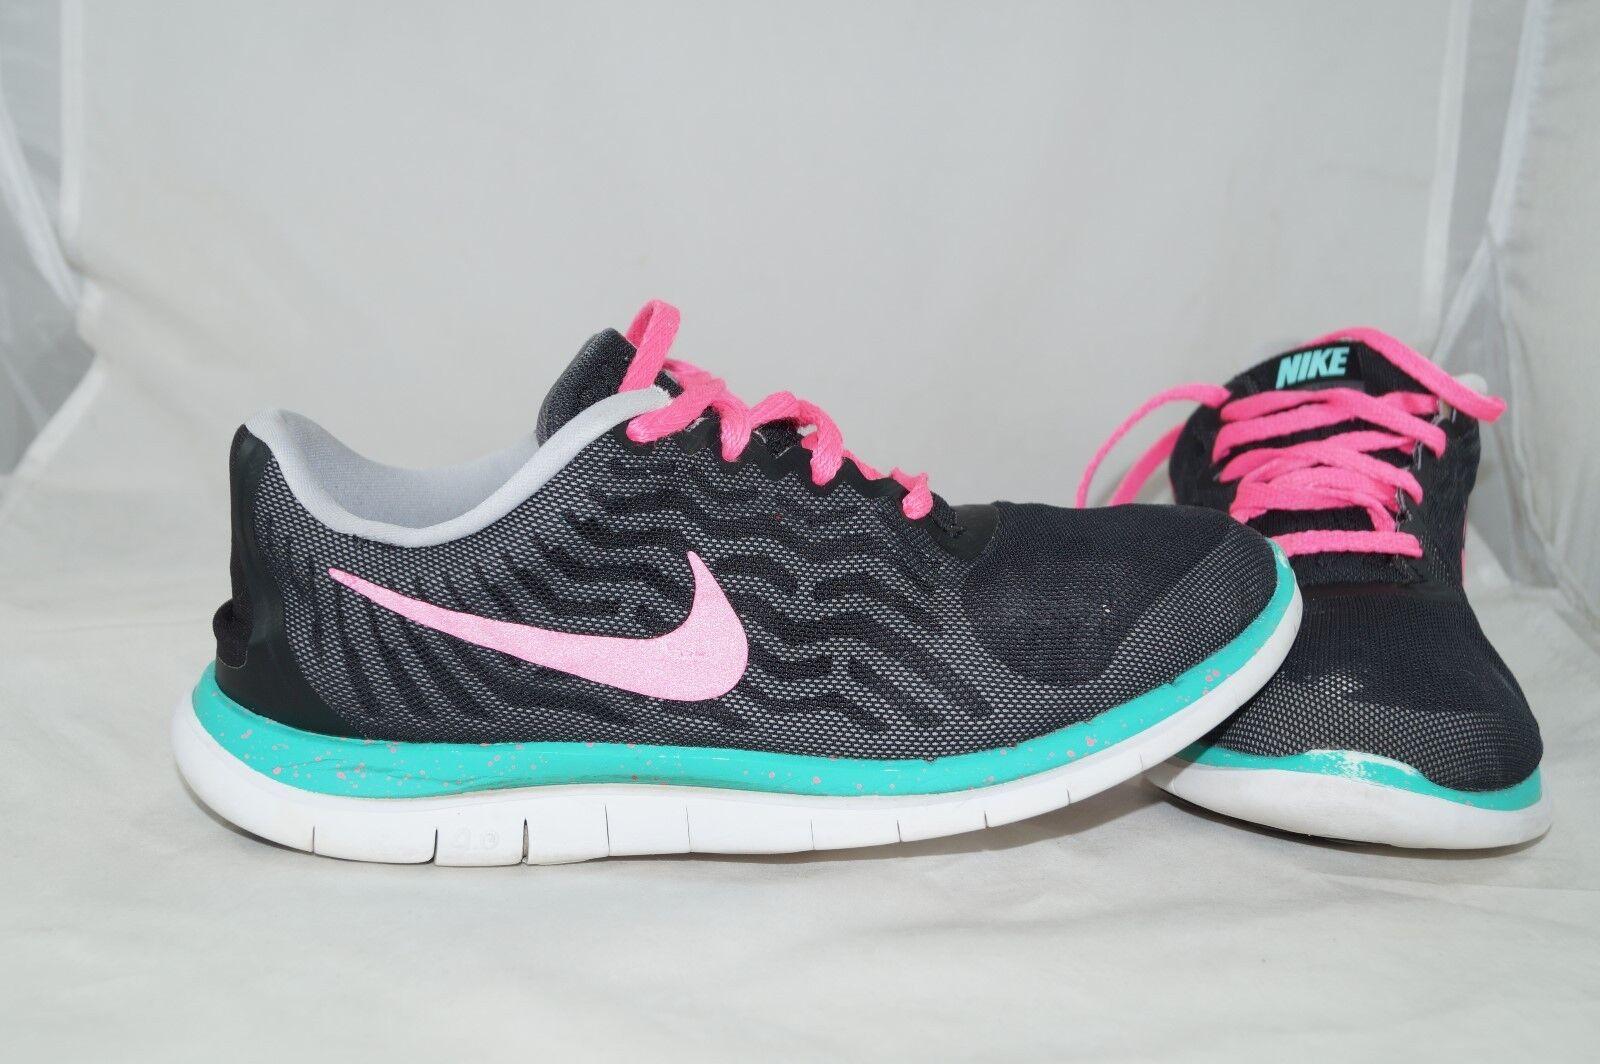 NIKE Free Run NIKEiD GR  rosa 38,5 Scarpe sportive sportive sportive da jogging ea174c